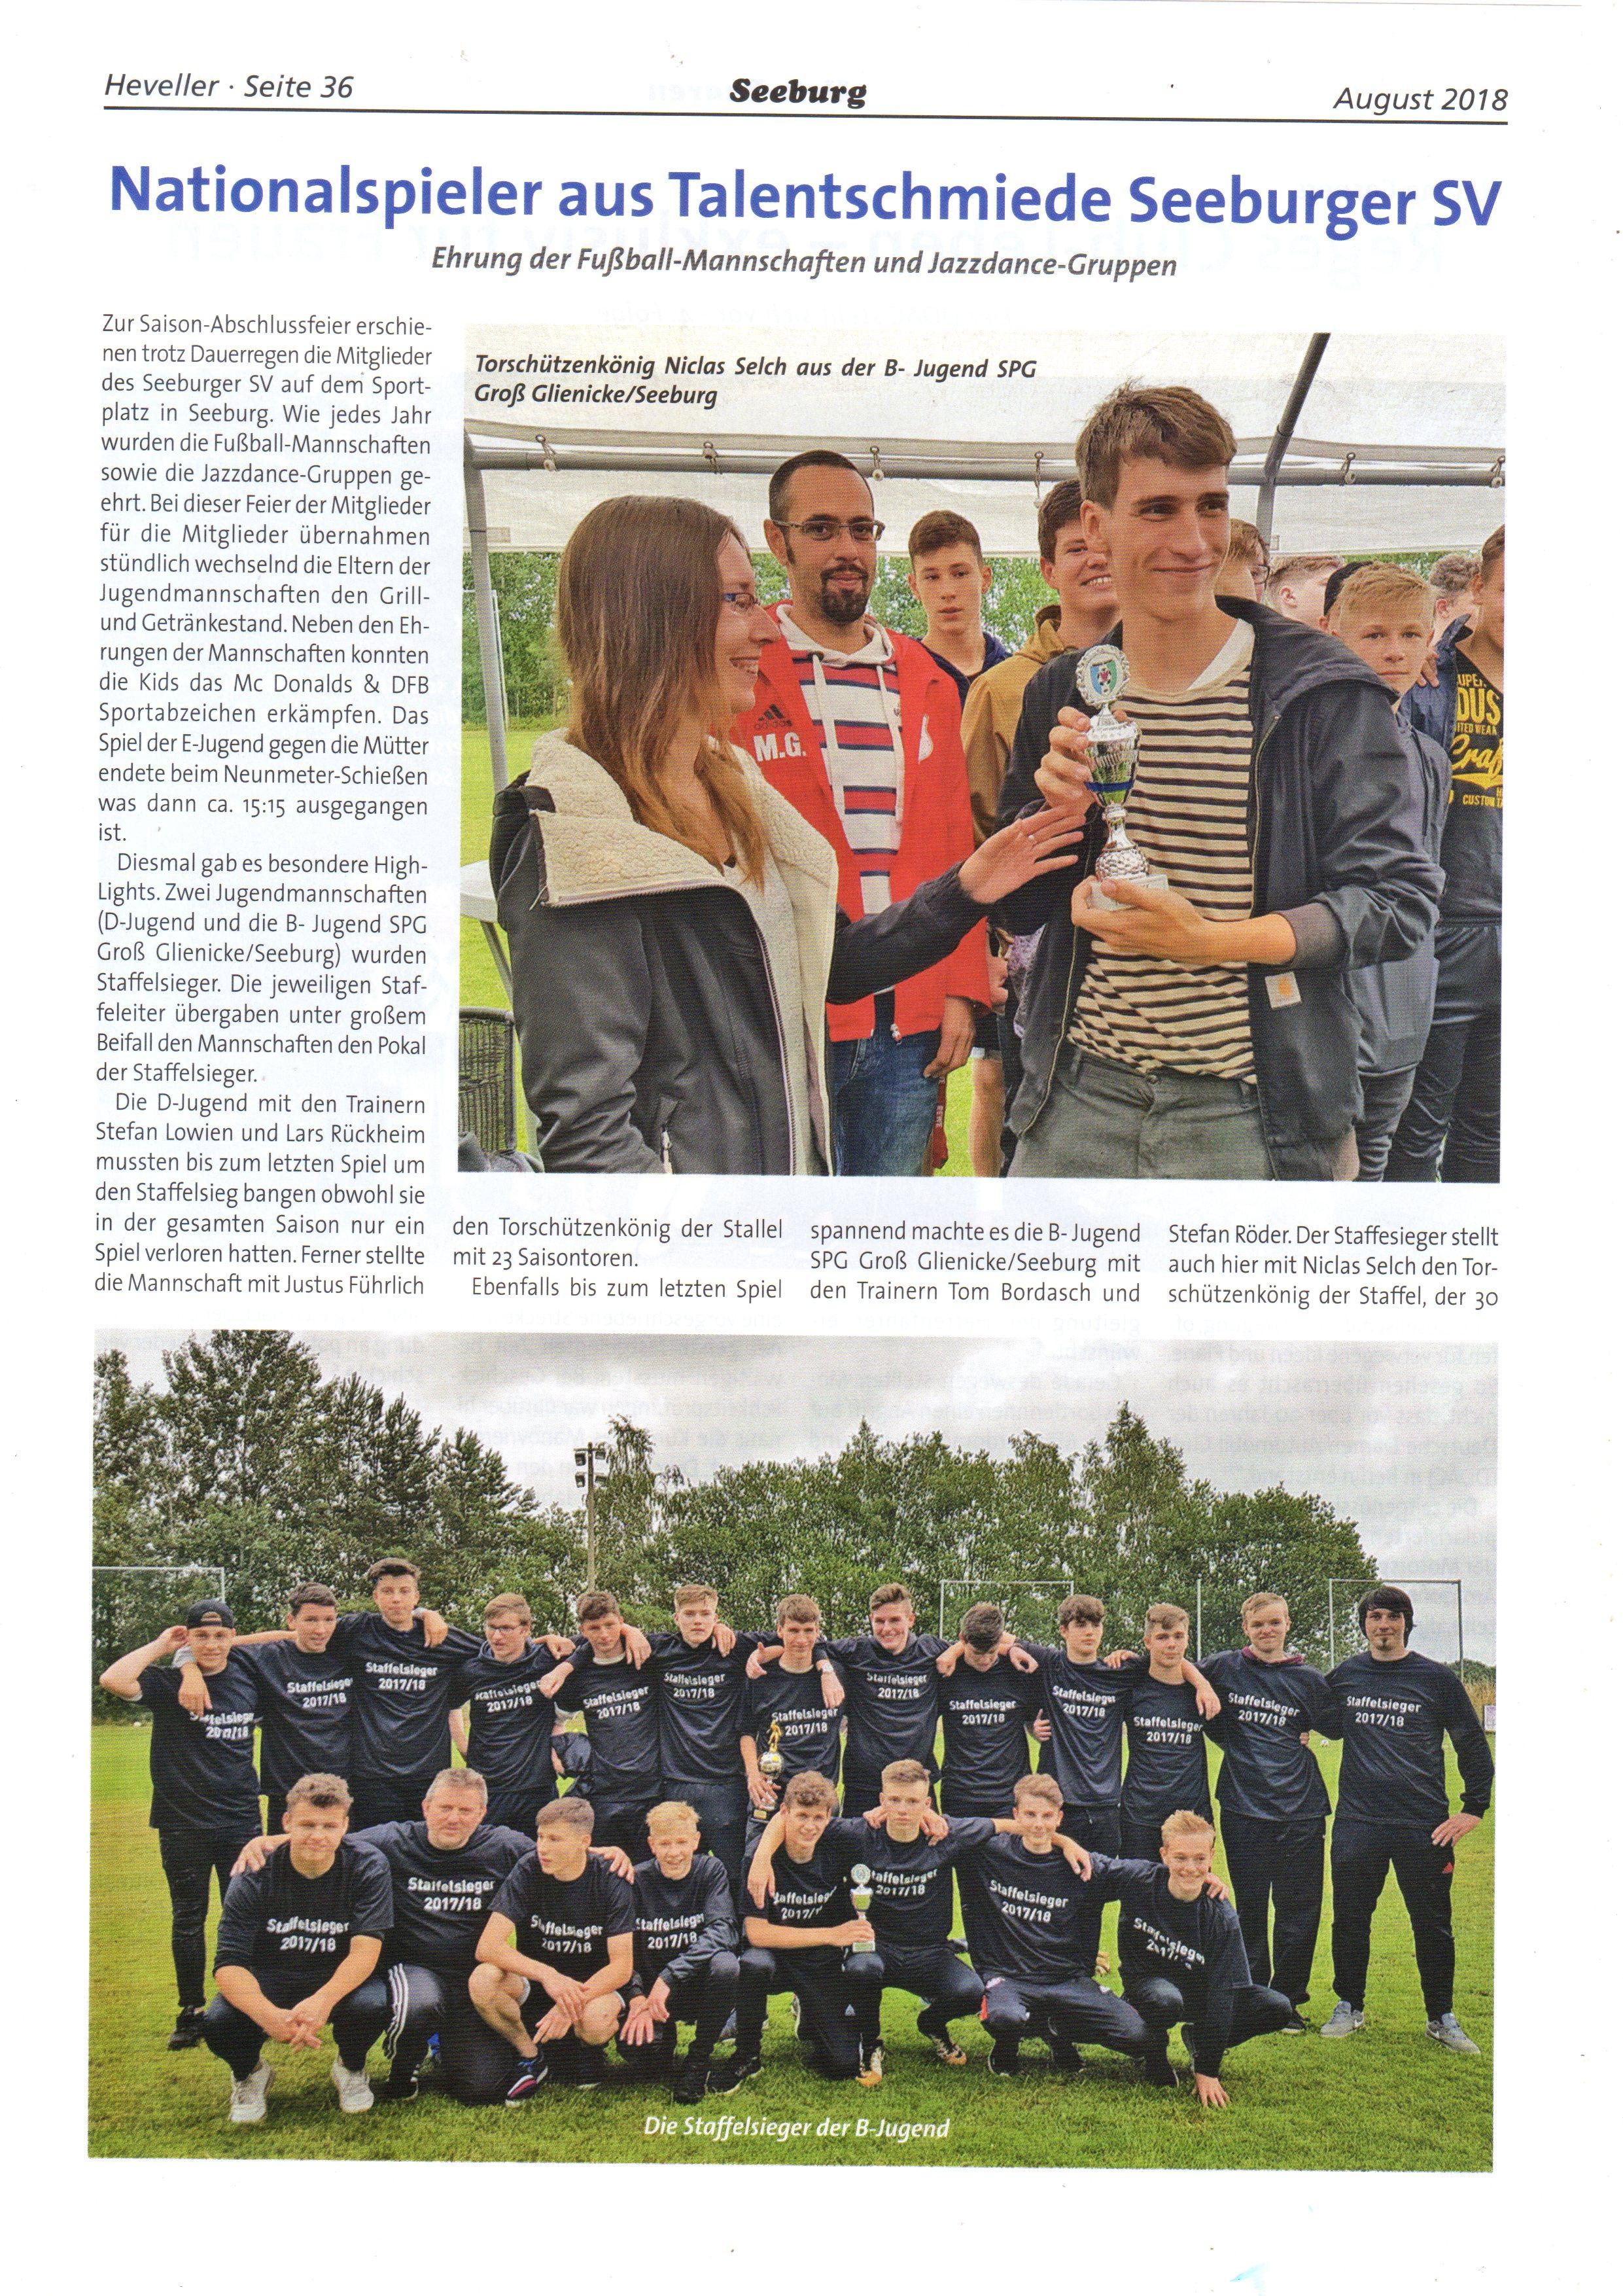 Bericht über den Saisonabschluss des Seeburger SV durch den Heveller